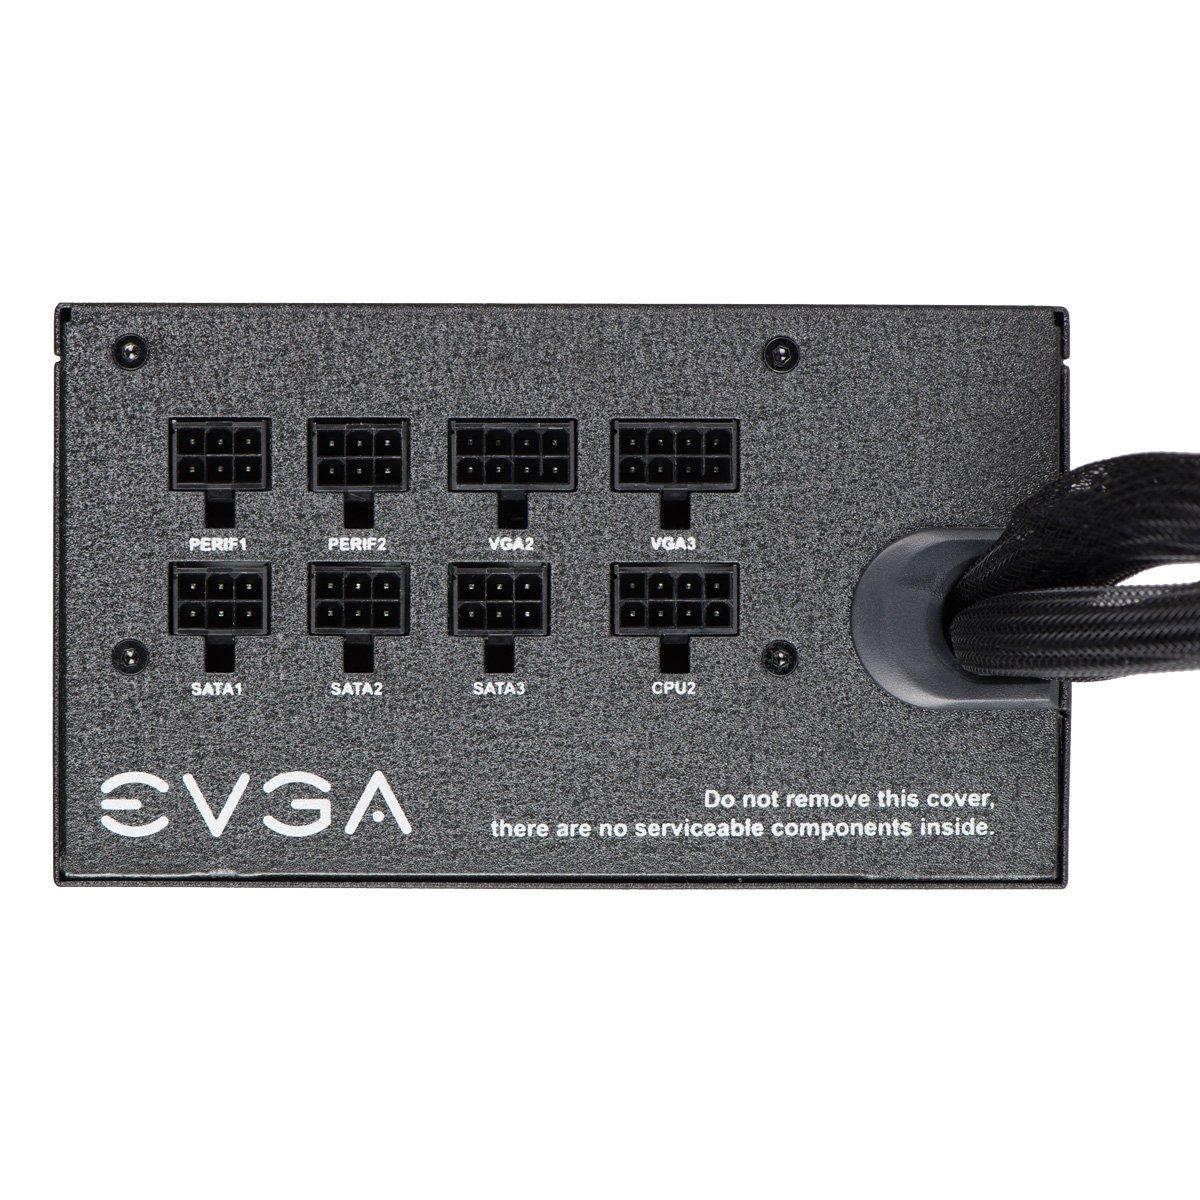 Bu0026q Cat5e Cable: Cat 5 Cable Bu0026q - Arbortech.usrh:arbortech.us,Design